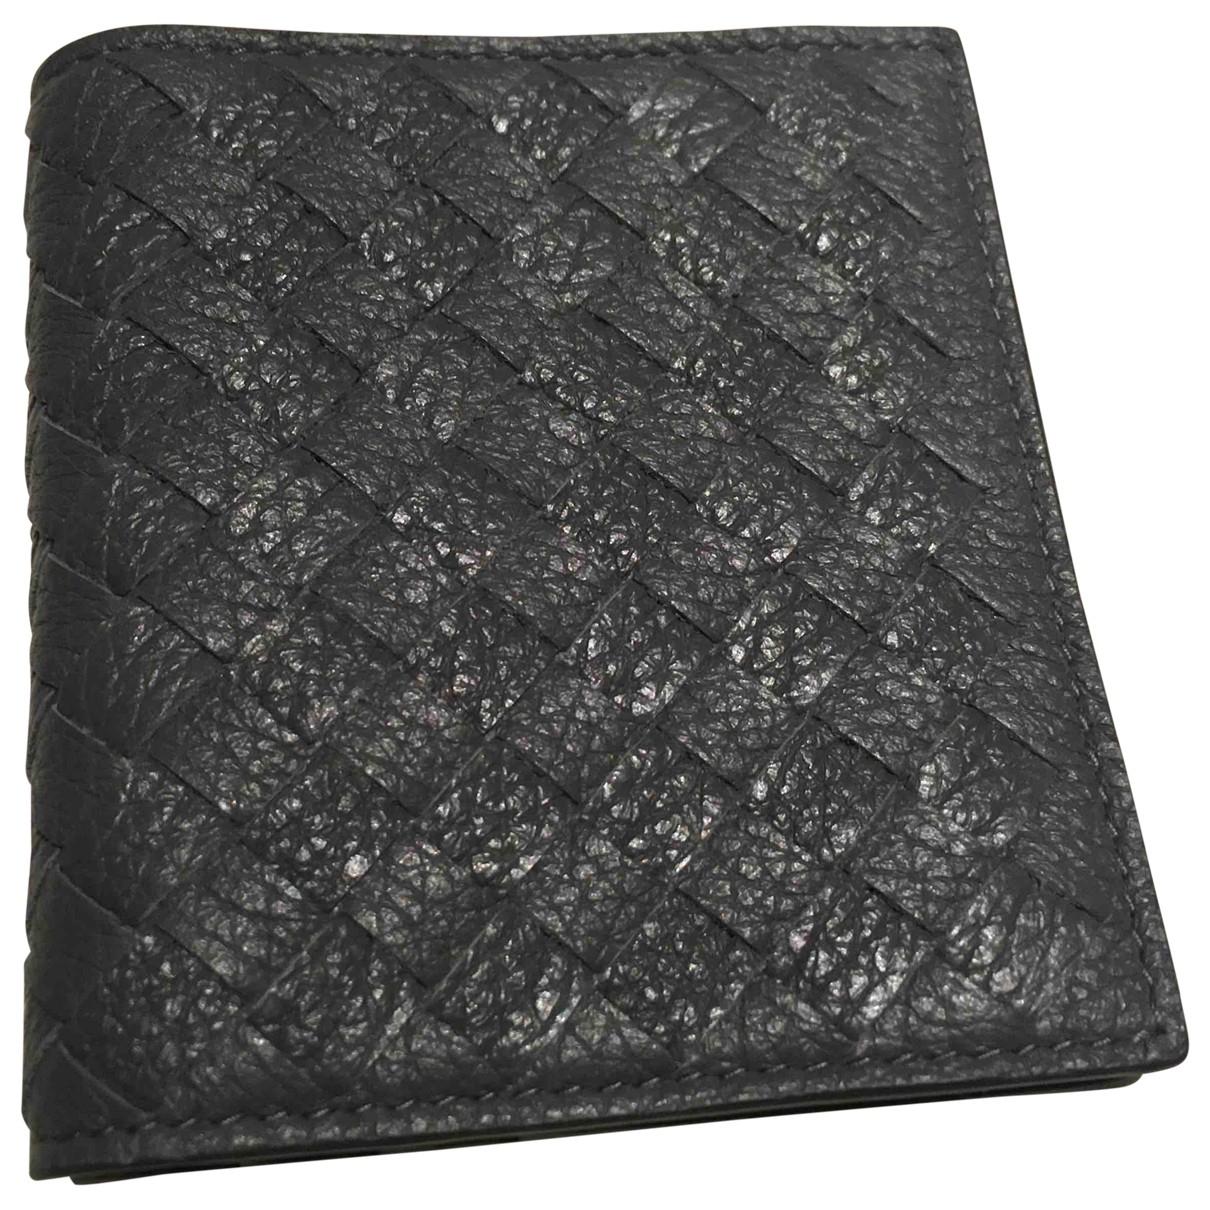 Bottega Veneta - Petite maroquinerie   pour femme en cuir - gris